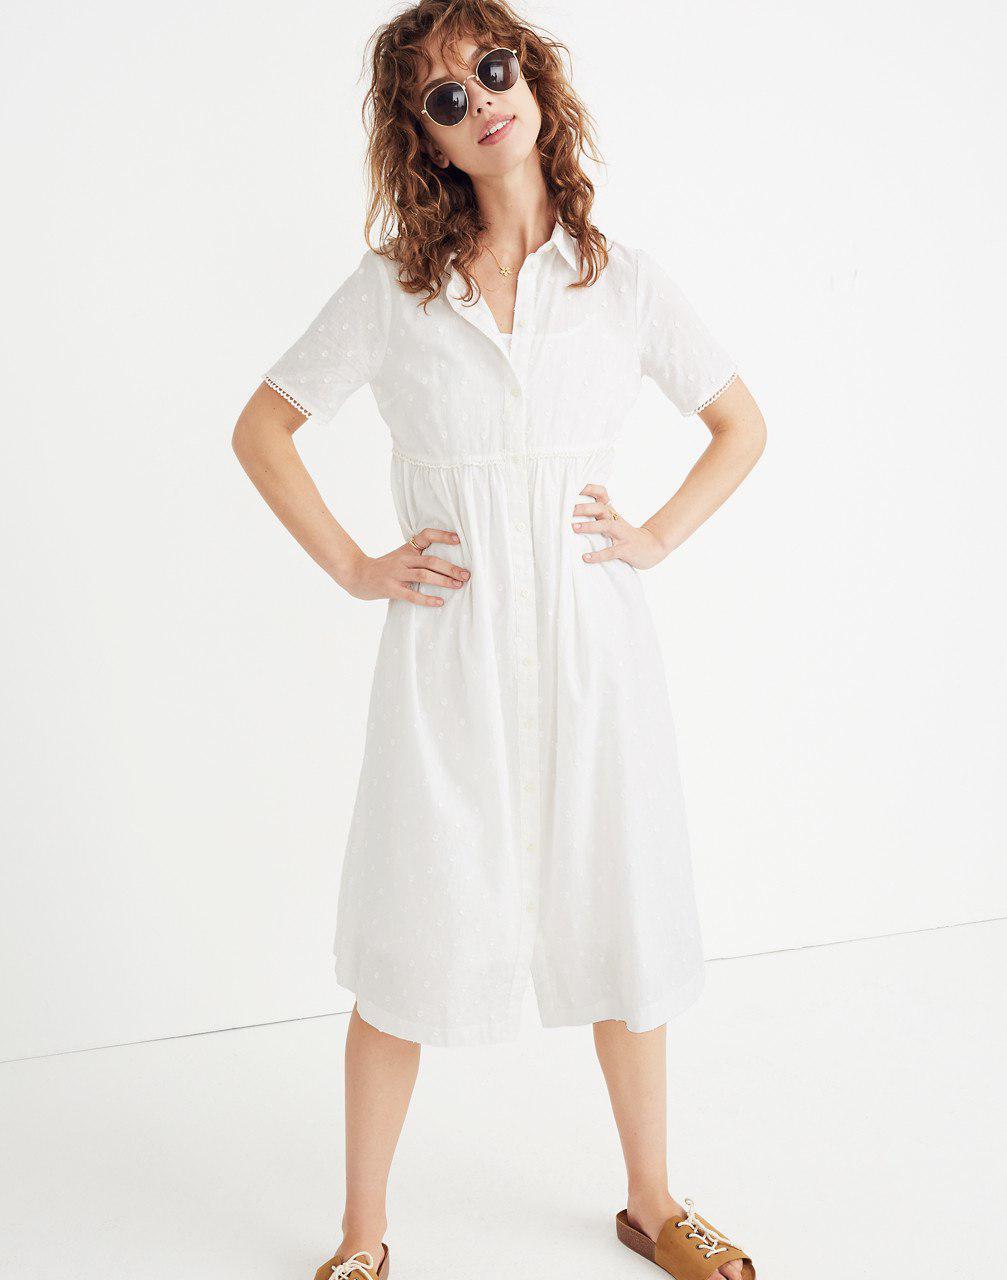 46bb1a19cd Madewell Clipdot Midi Shirtdress in White - Lyst